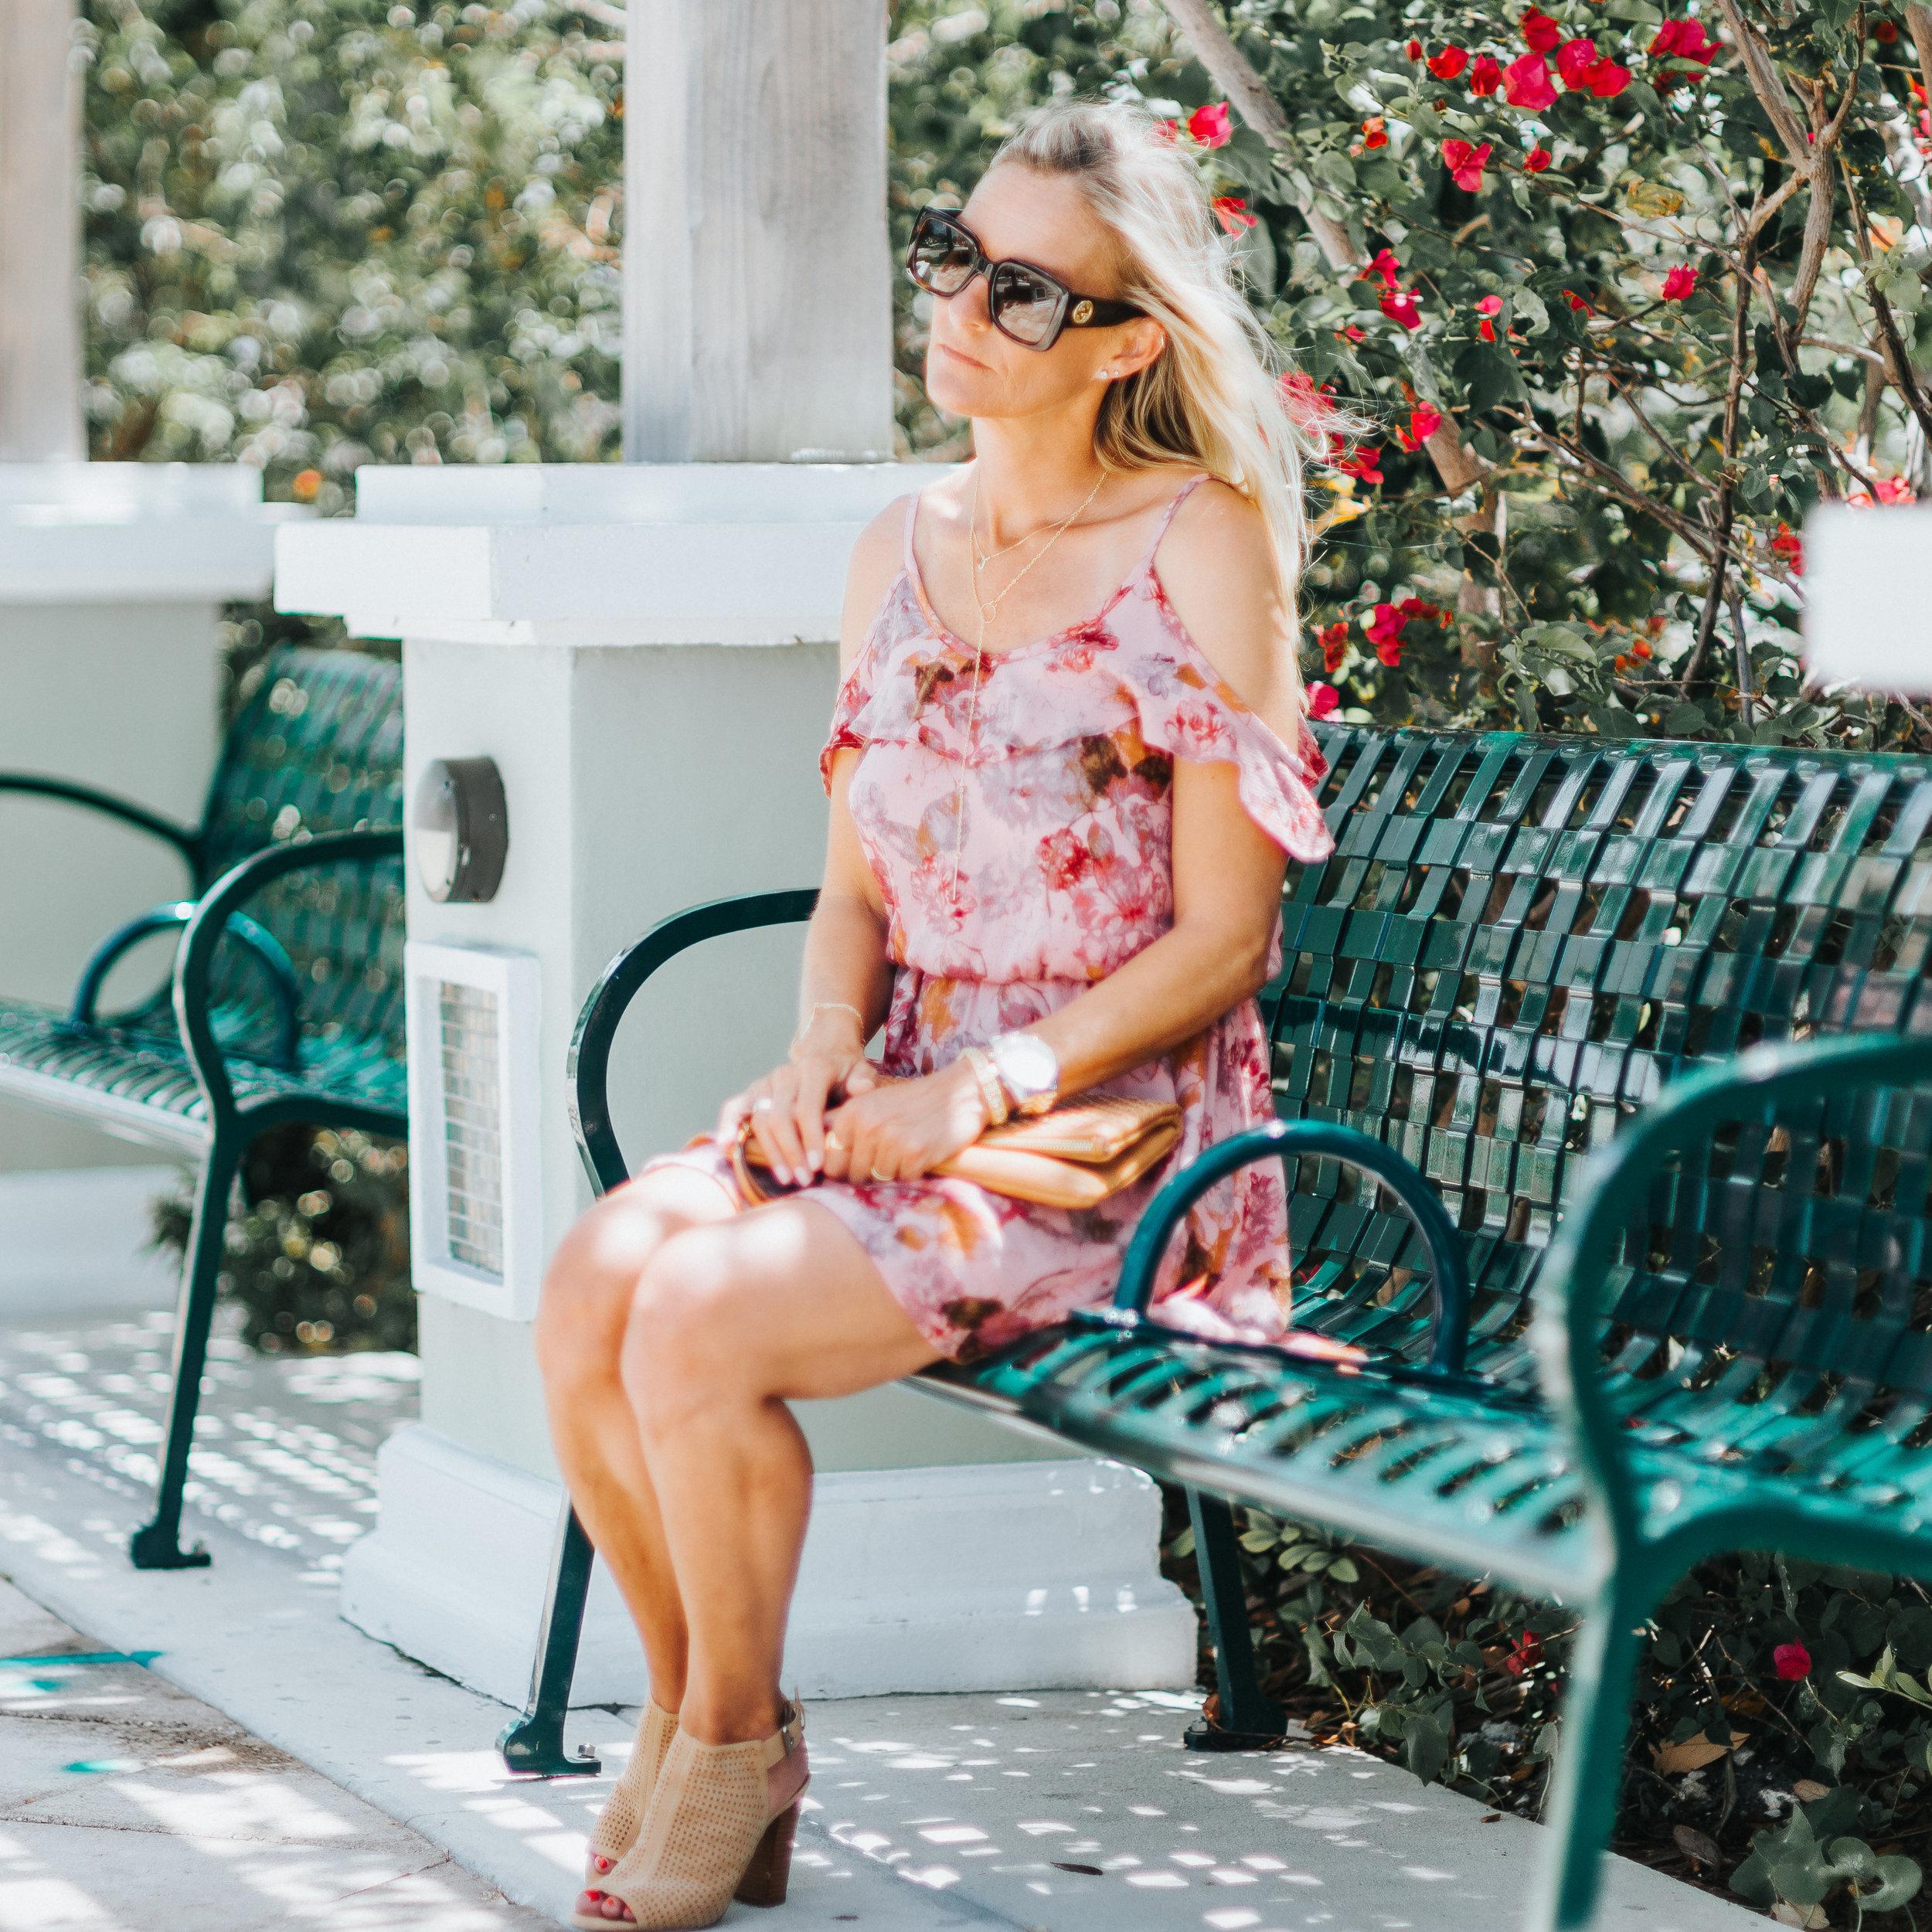 Photos by Gino Difarnecio ~   www.ginodifarnecio.com   //   @gdifarnecio   (Instagram)   Floral Dress (  SIMILAR   and   SIMILAR  ) //   Booties   //   Watch   //   Sunglasses   //   Bracelet   // Clutch (  SIMILAR  ) //   Initial Necklace   //   Lariat Necklace   //   Ring